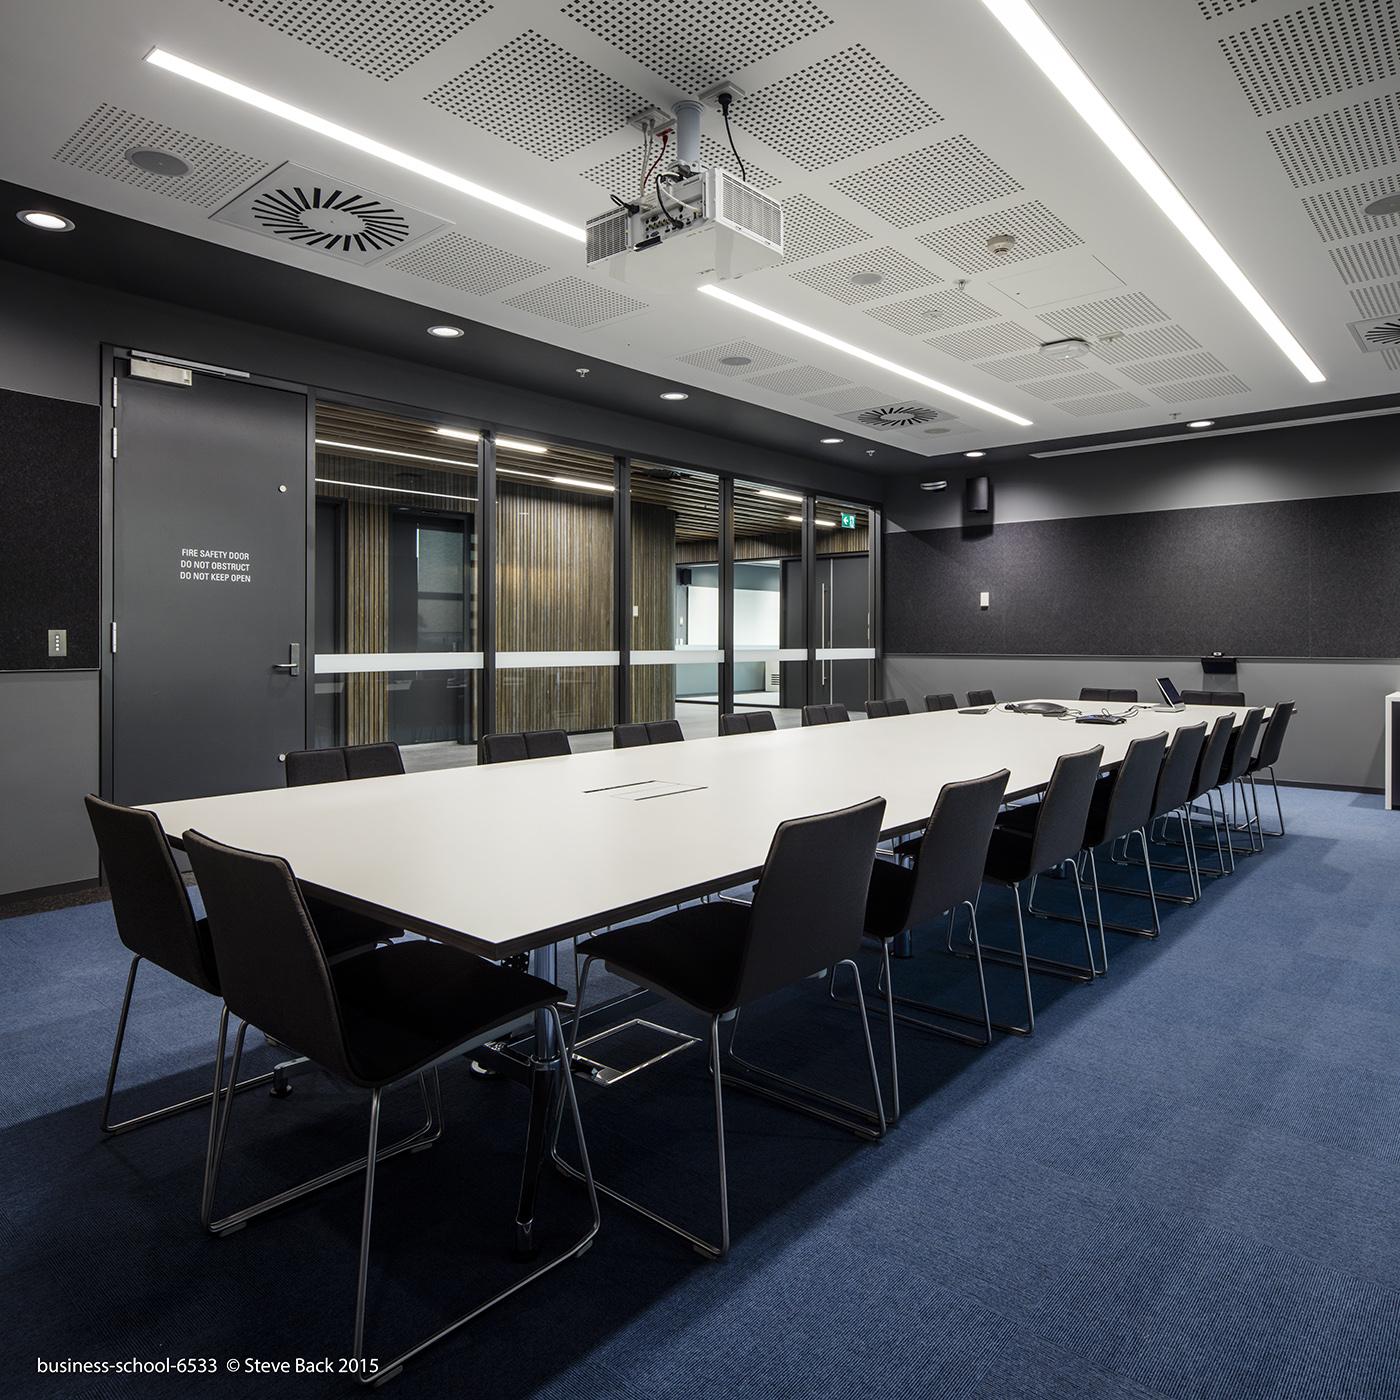 business-school-6533.jpg